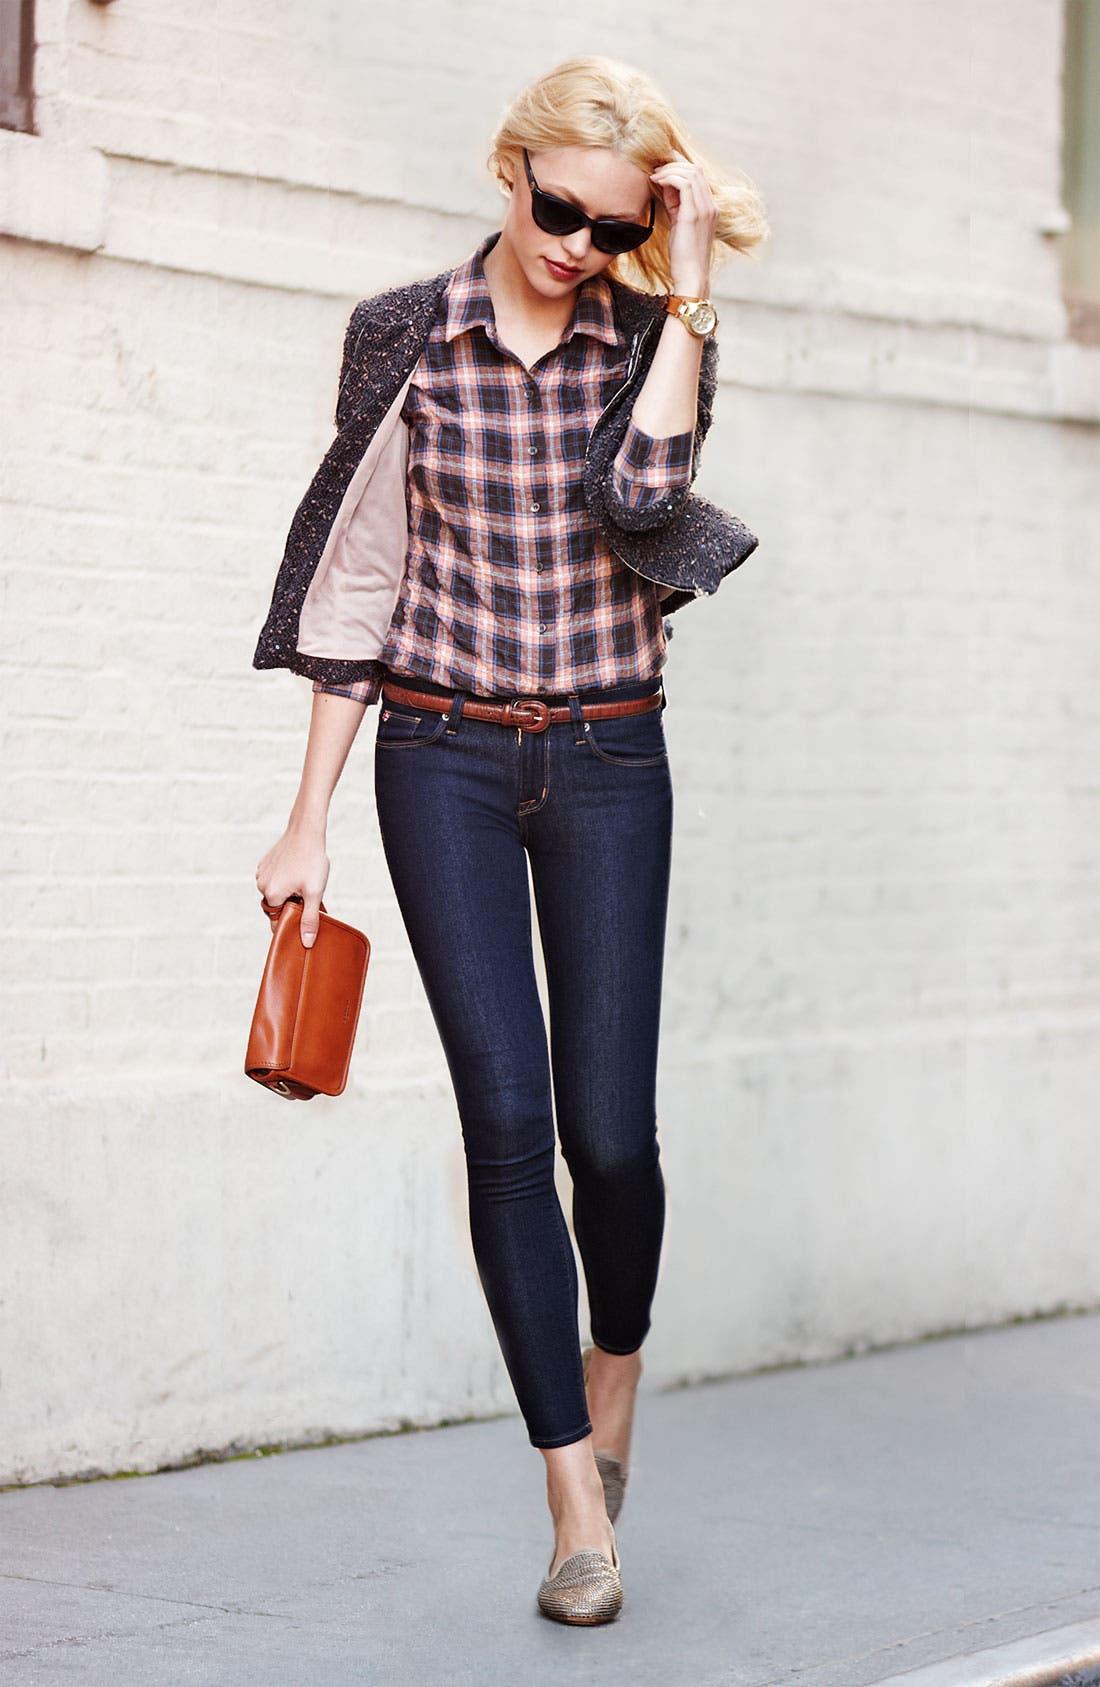 Alternate Image 1 Selected - Pure Sugar Jacket, James Perse Shirt & Hudson Jeans